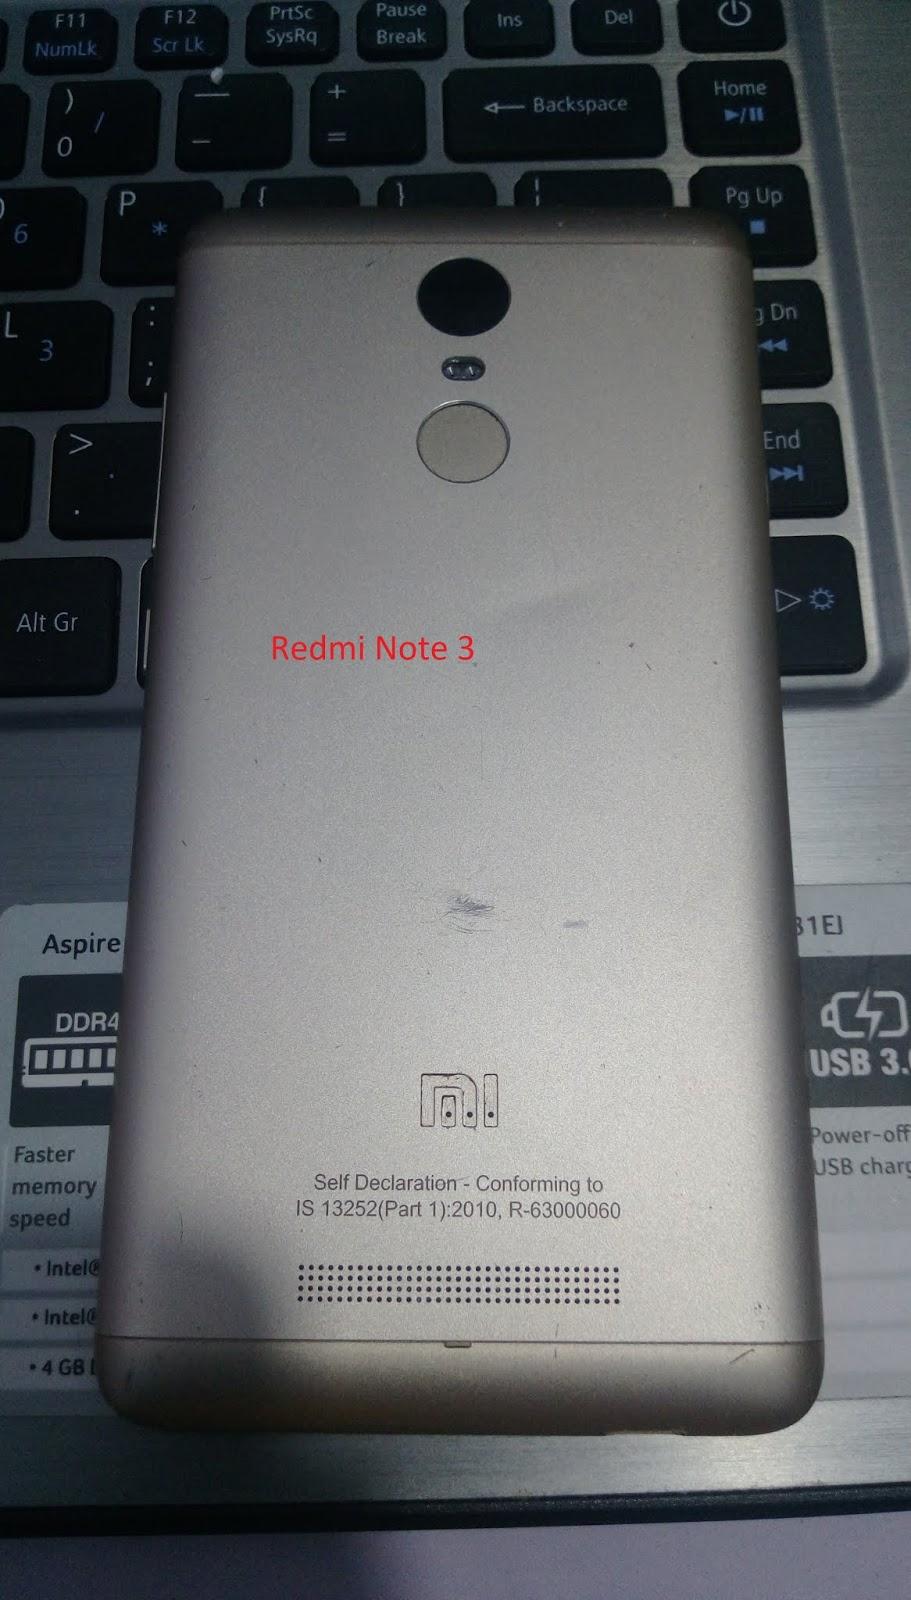 Mi Readmi Note 3 R-63000060 Flash File 100%Free Download Mi